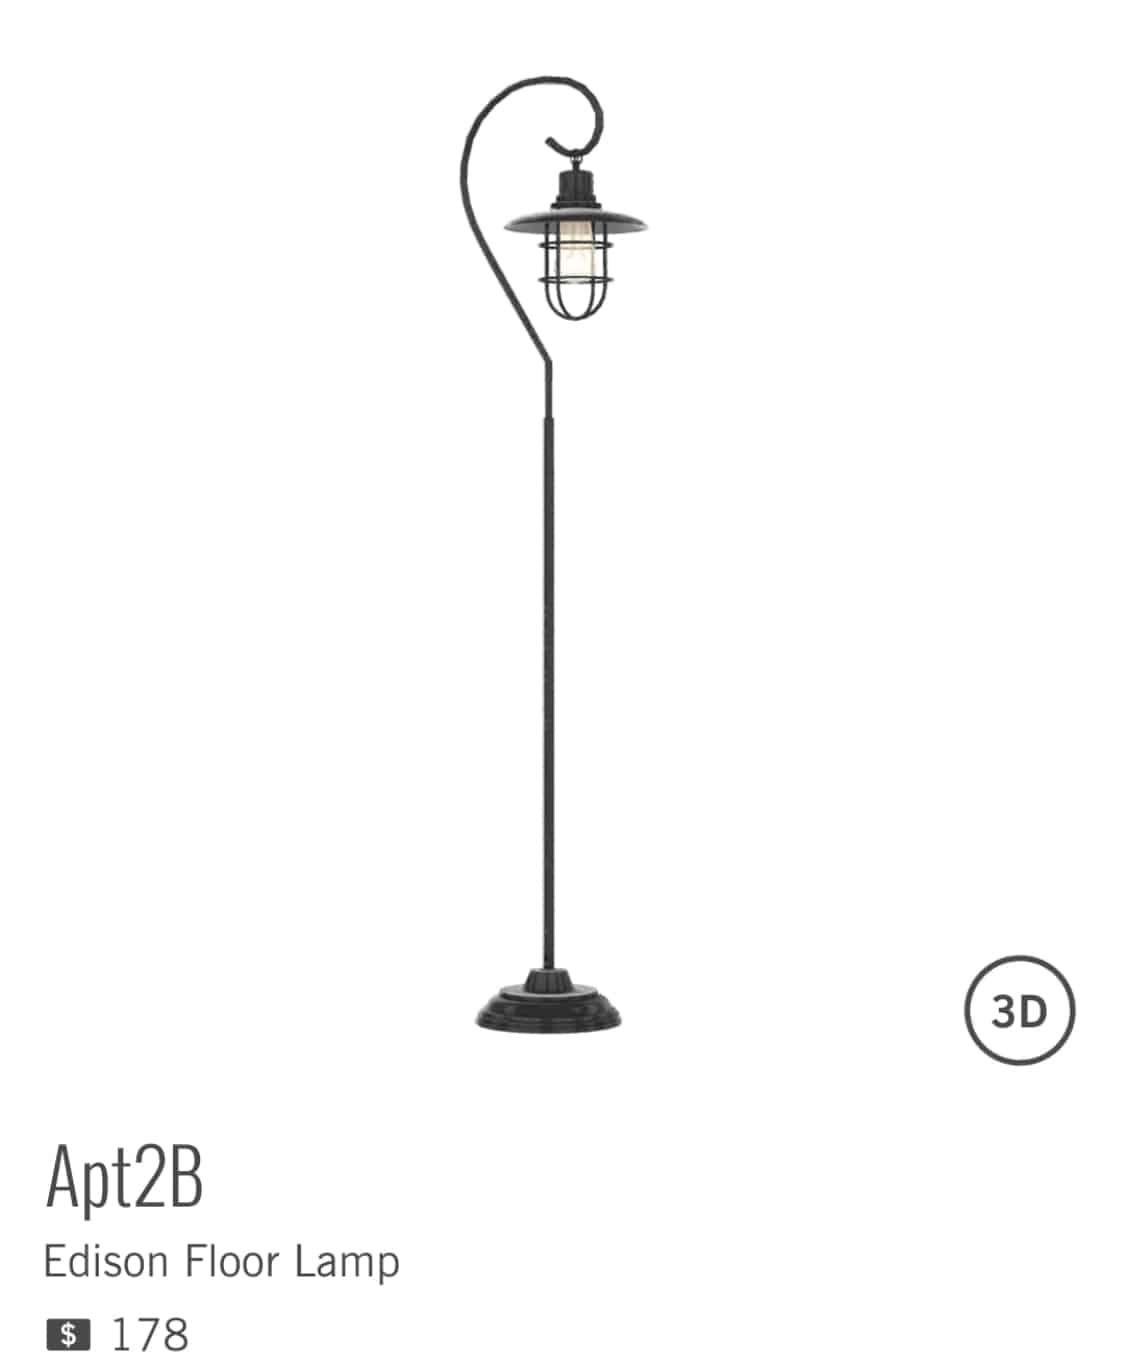 EDISON FLOOR LAMP de APT2B à $178